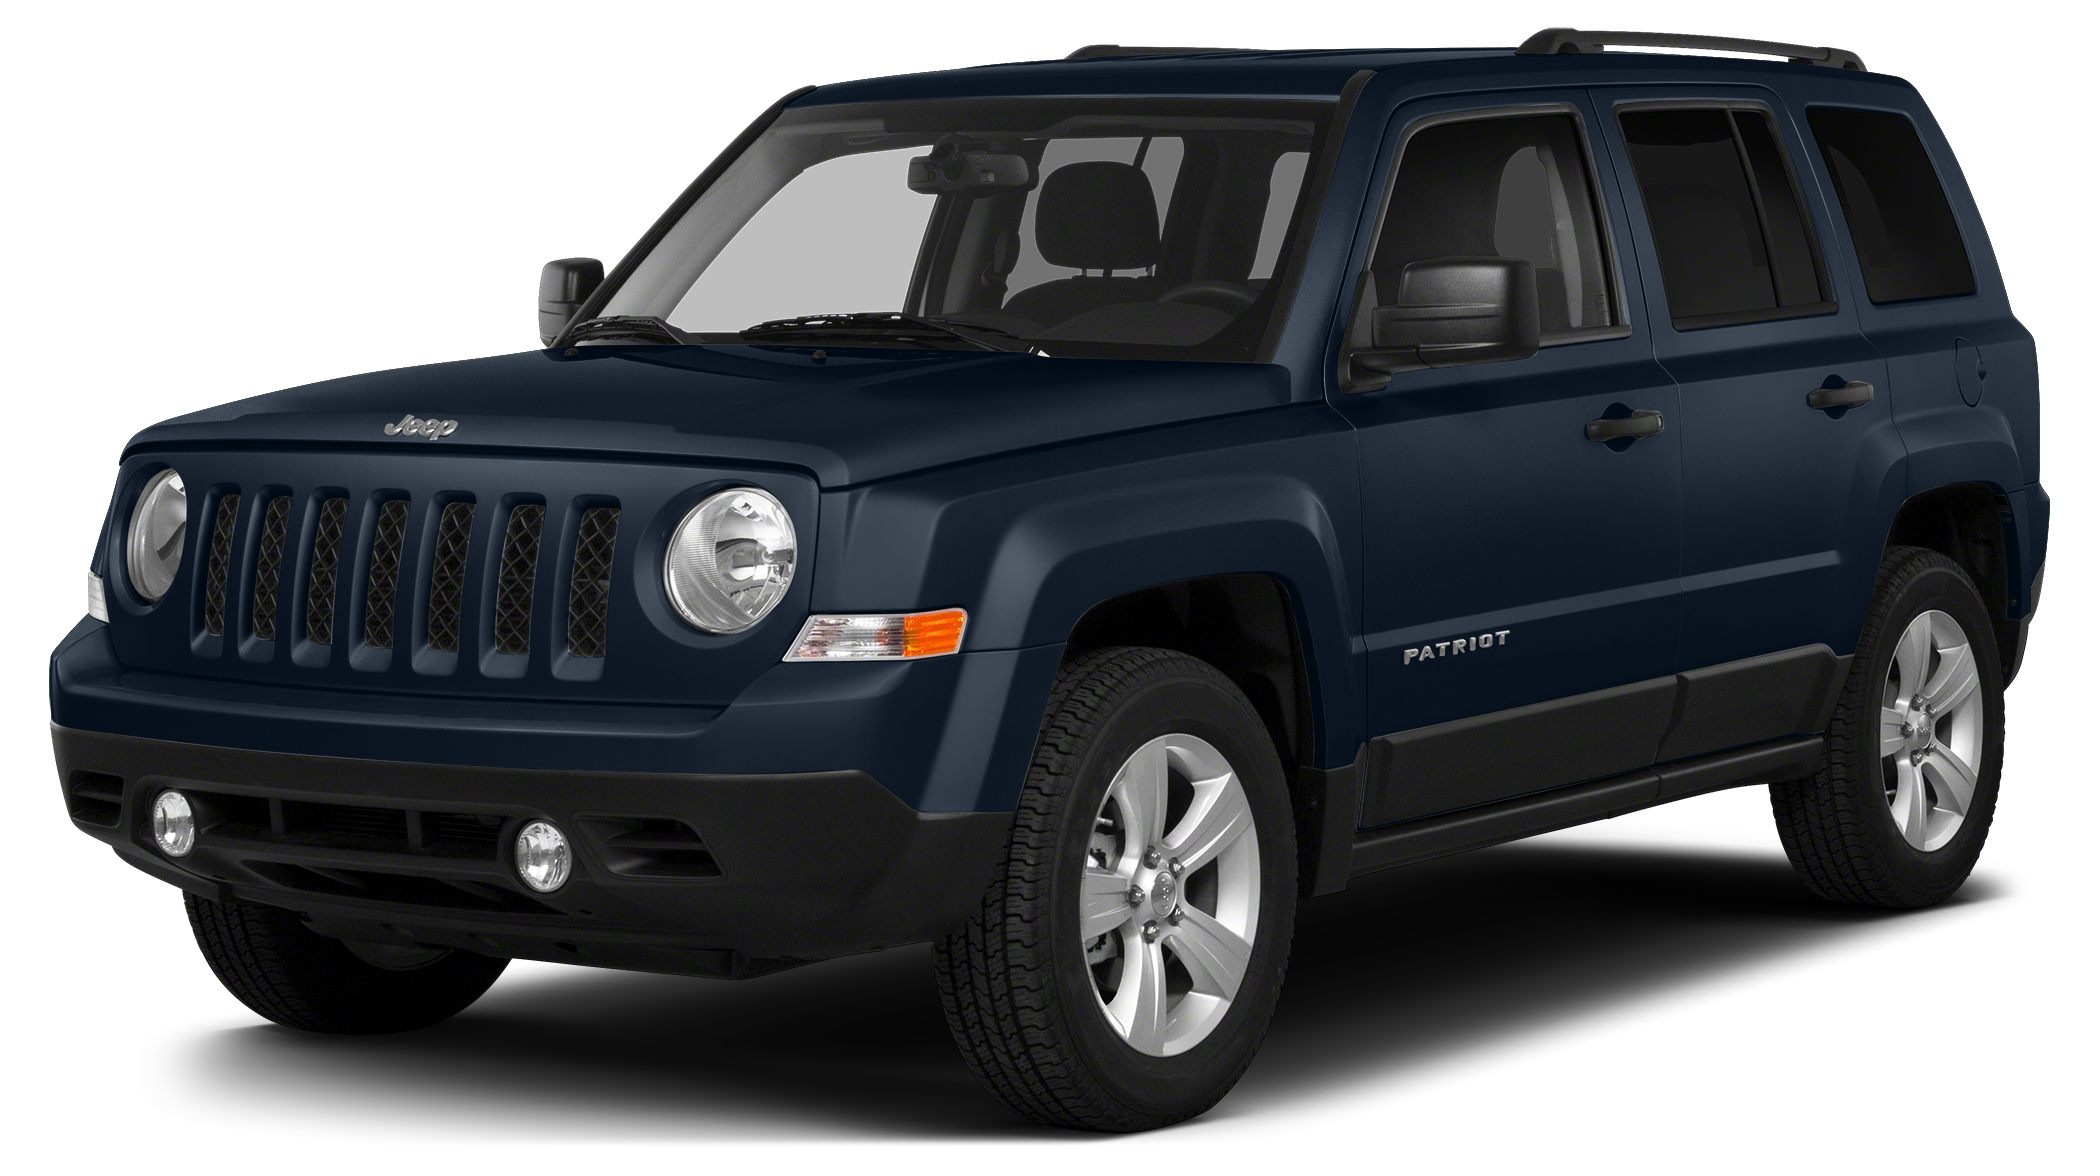 2016 Jeep Patriot Sport Miles 6083Color True Blue Pearlcoat Stock 61619 VIN 1C4NJRBB6GD65440